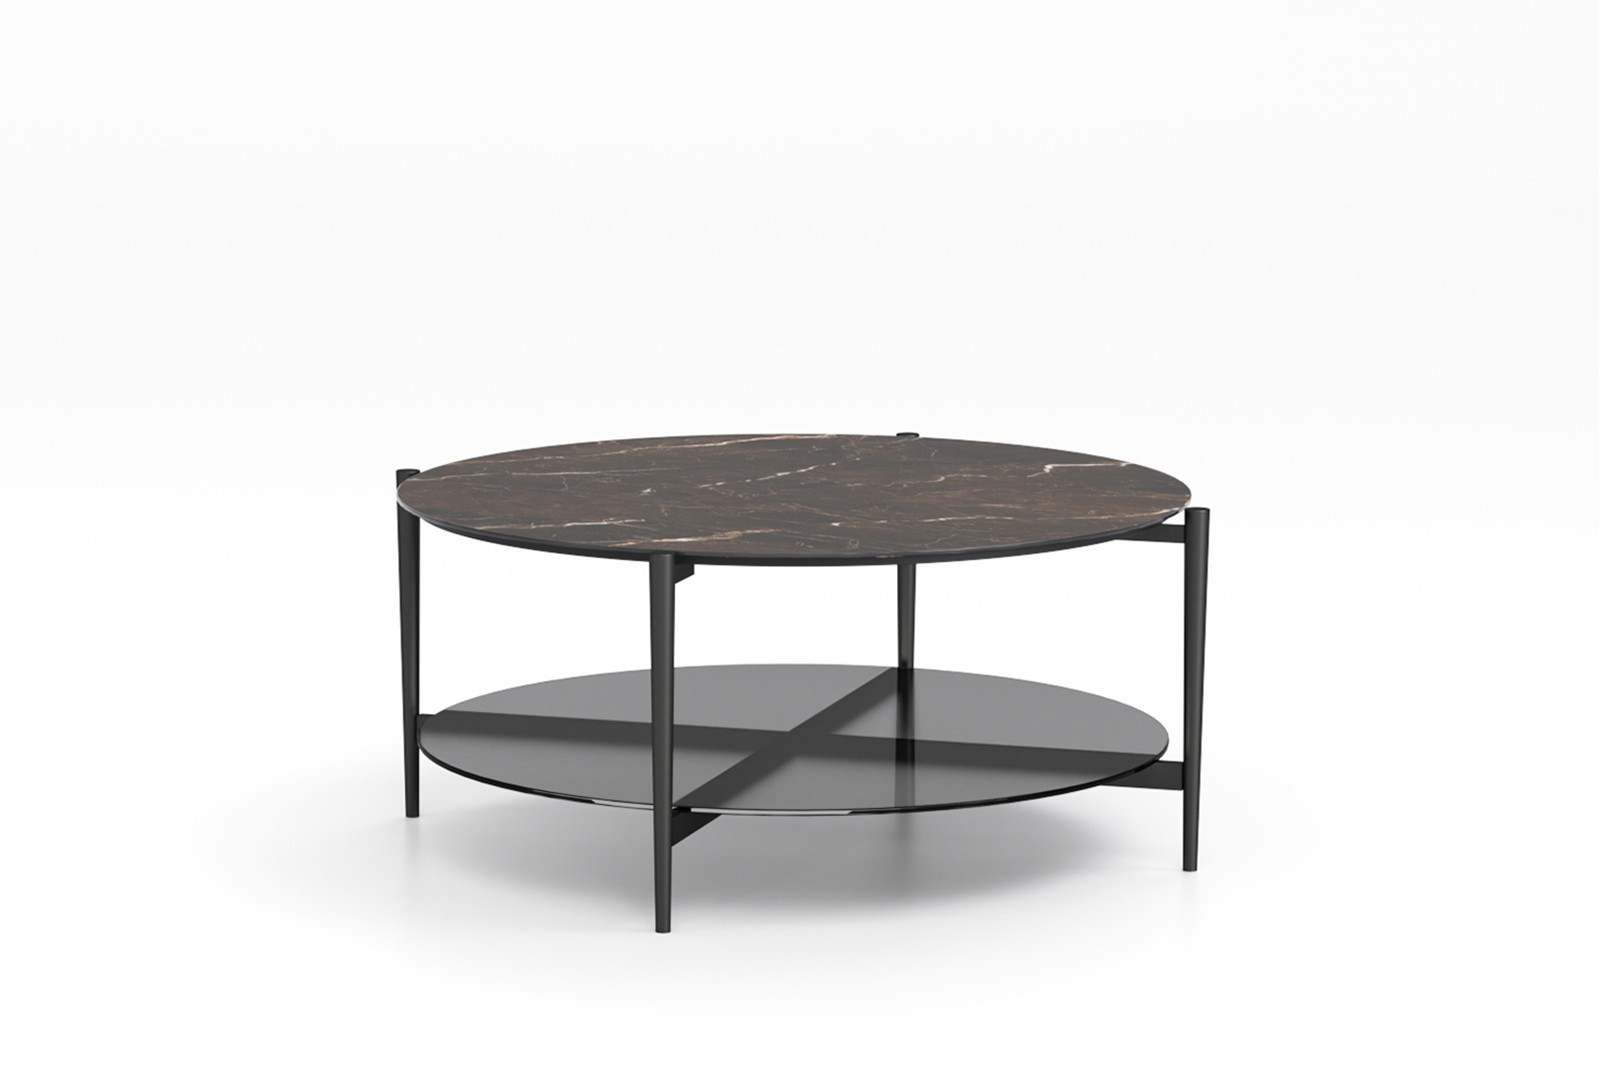 COFFEE TABLE N.53 METAL CERAMIC GLASS